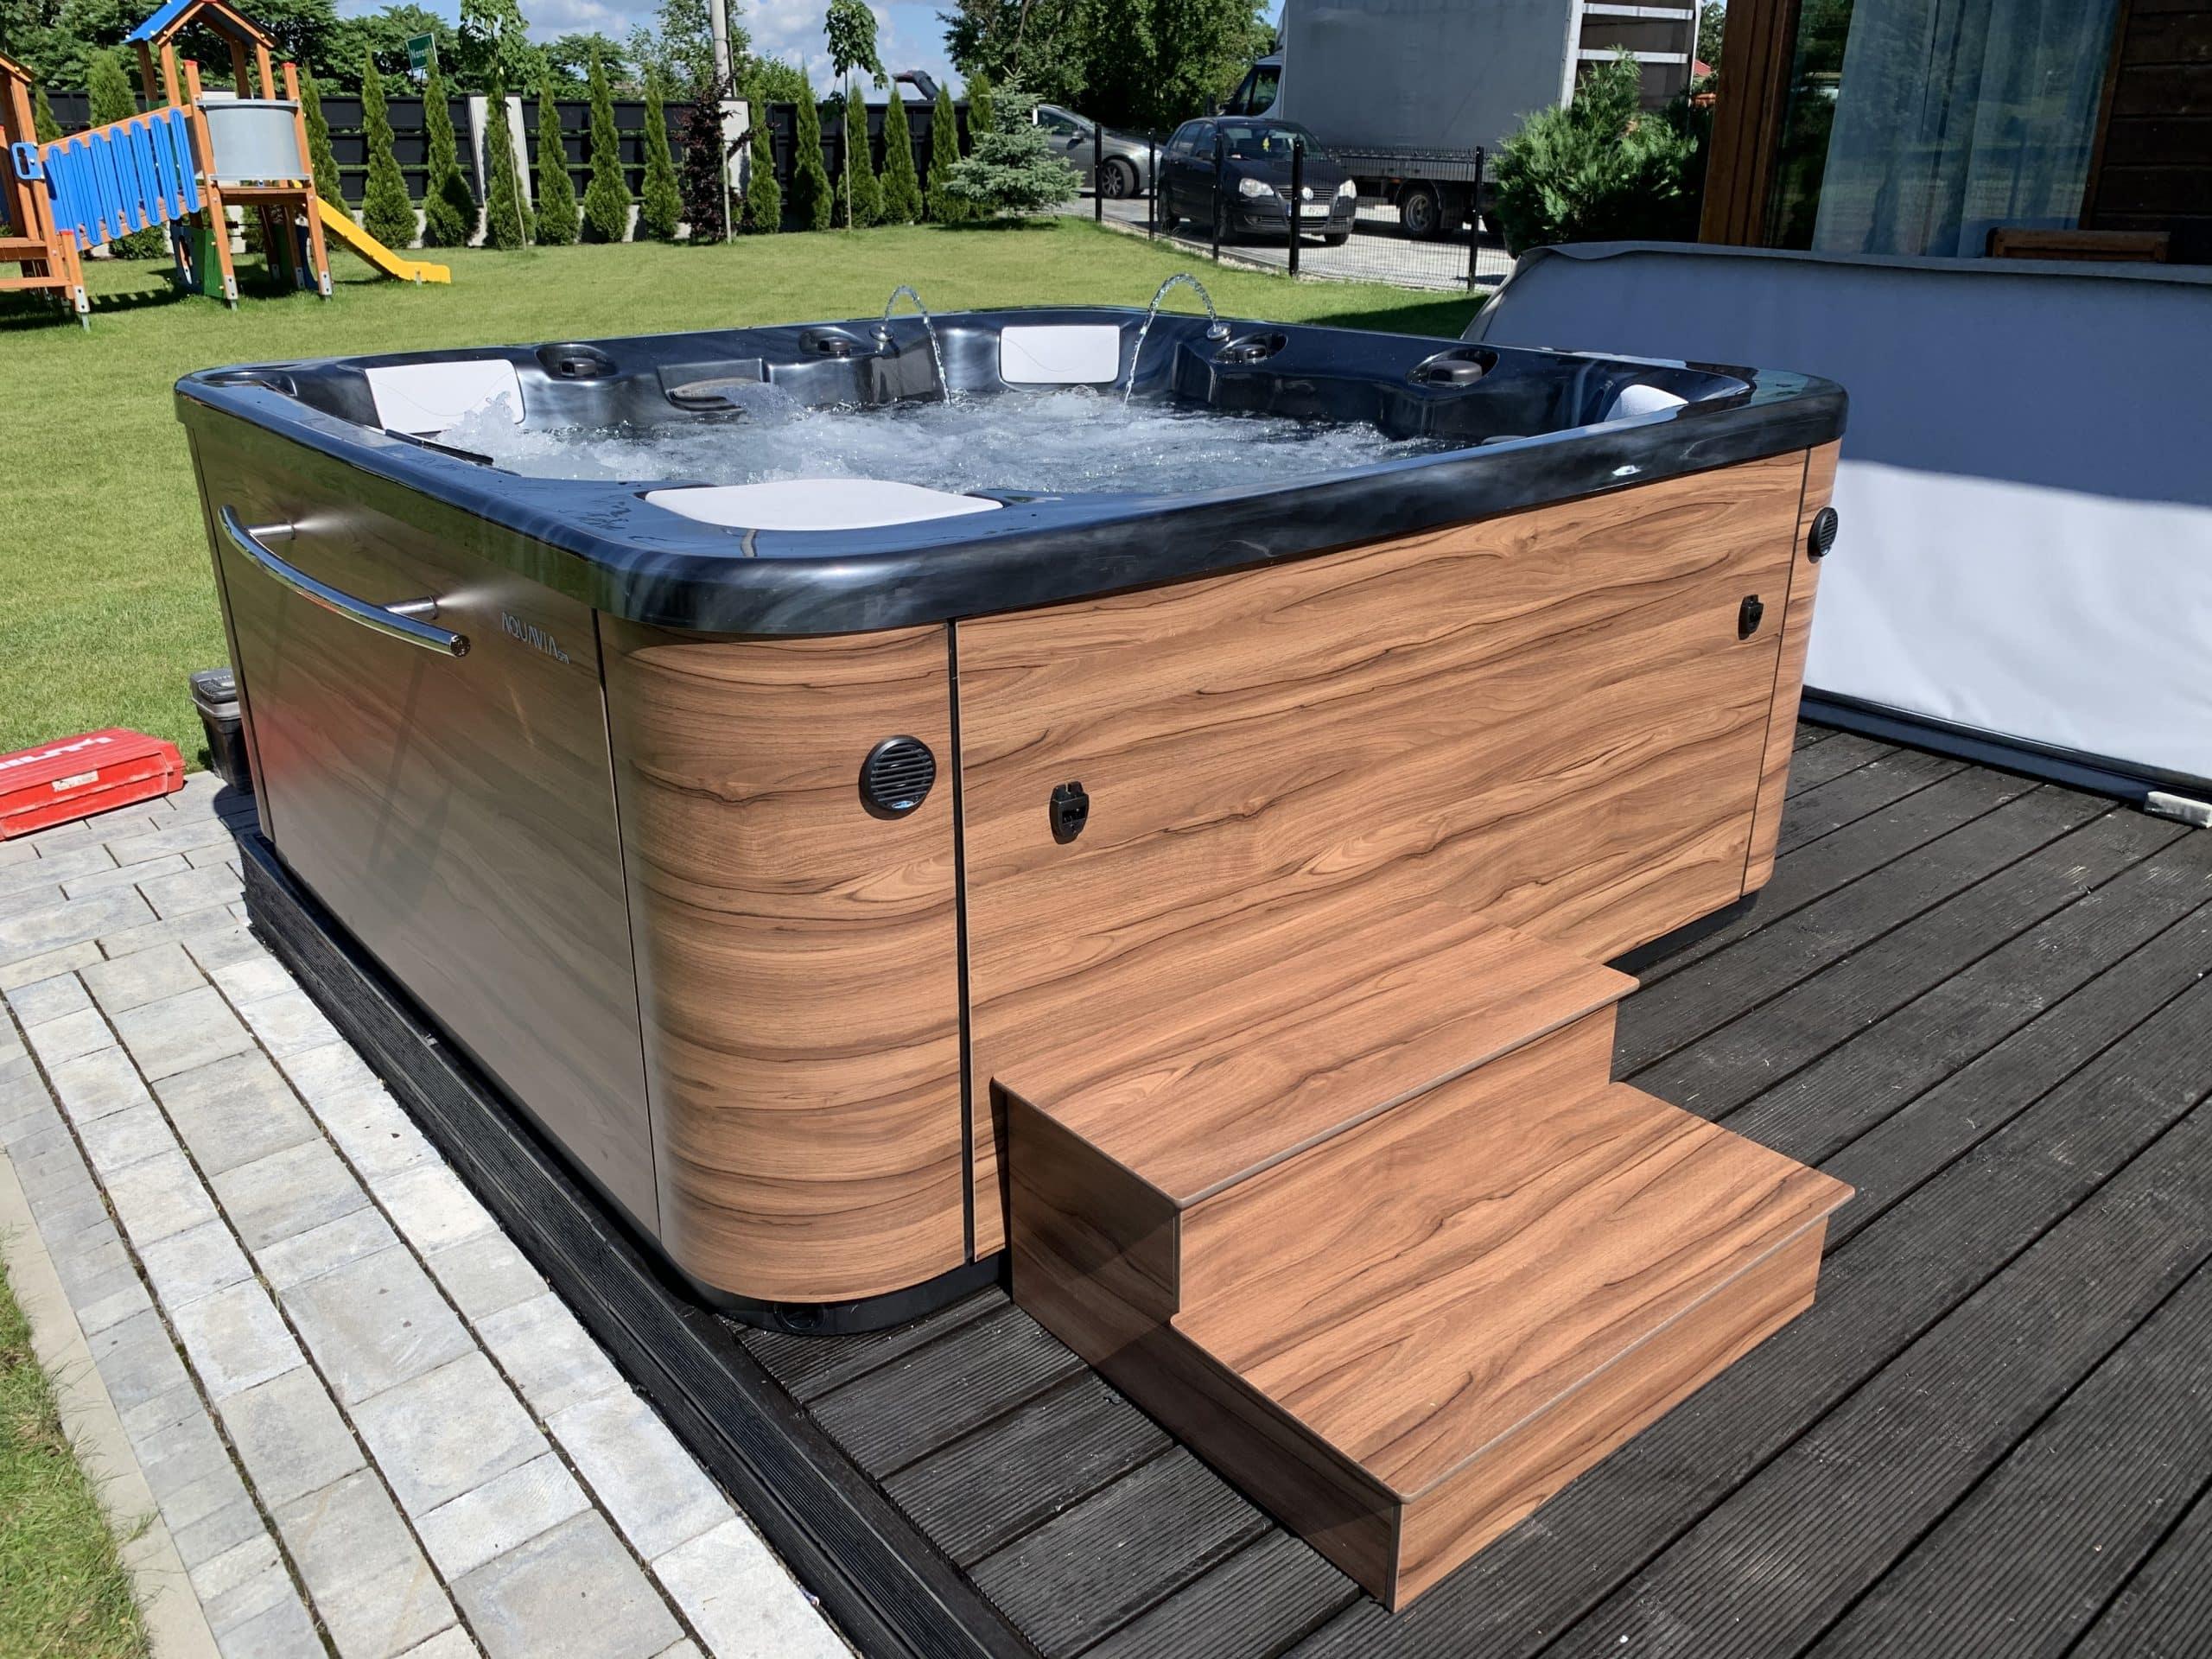 wanna spa ogrodowa jacuzzi aquavia spa basenispa basen minibasen pokrywa termiczna